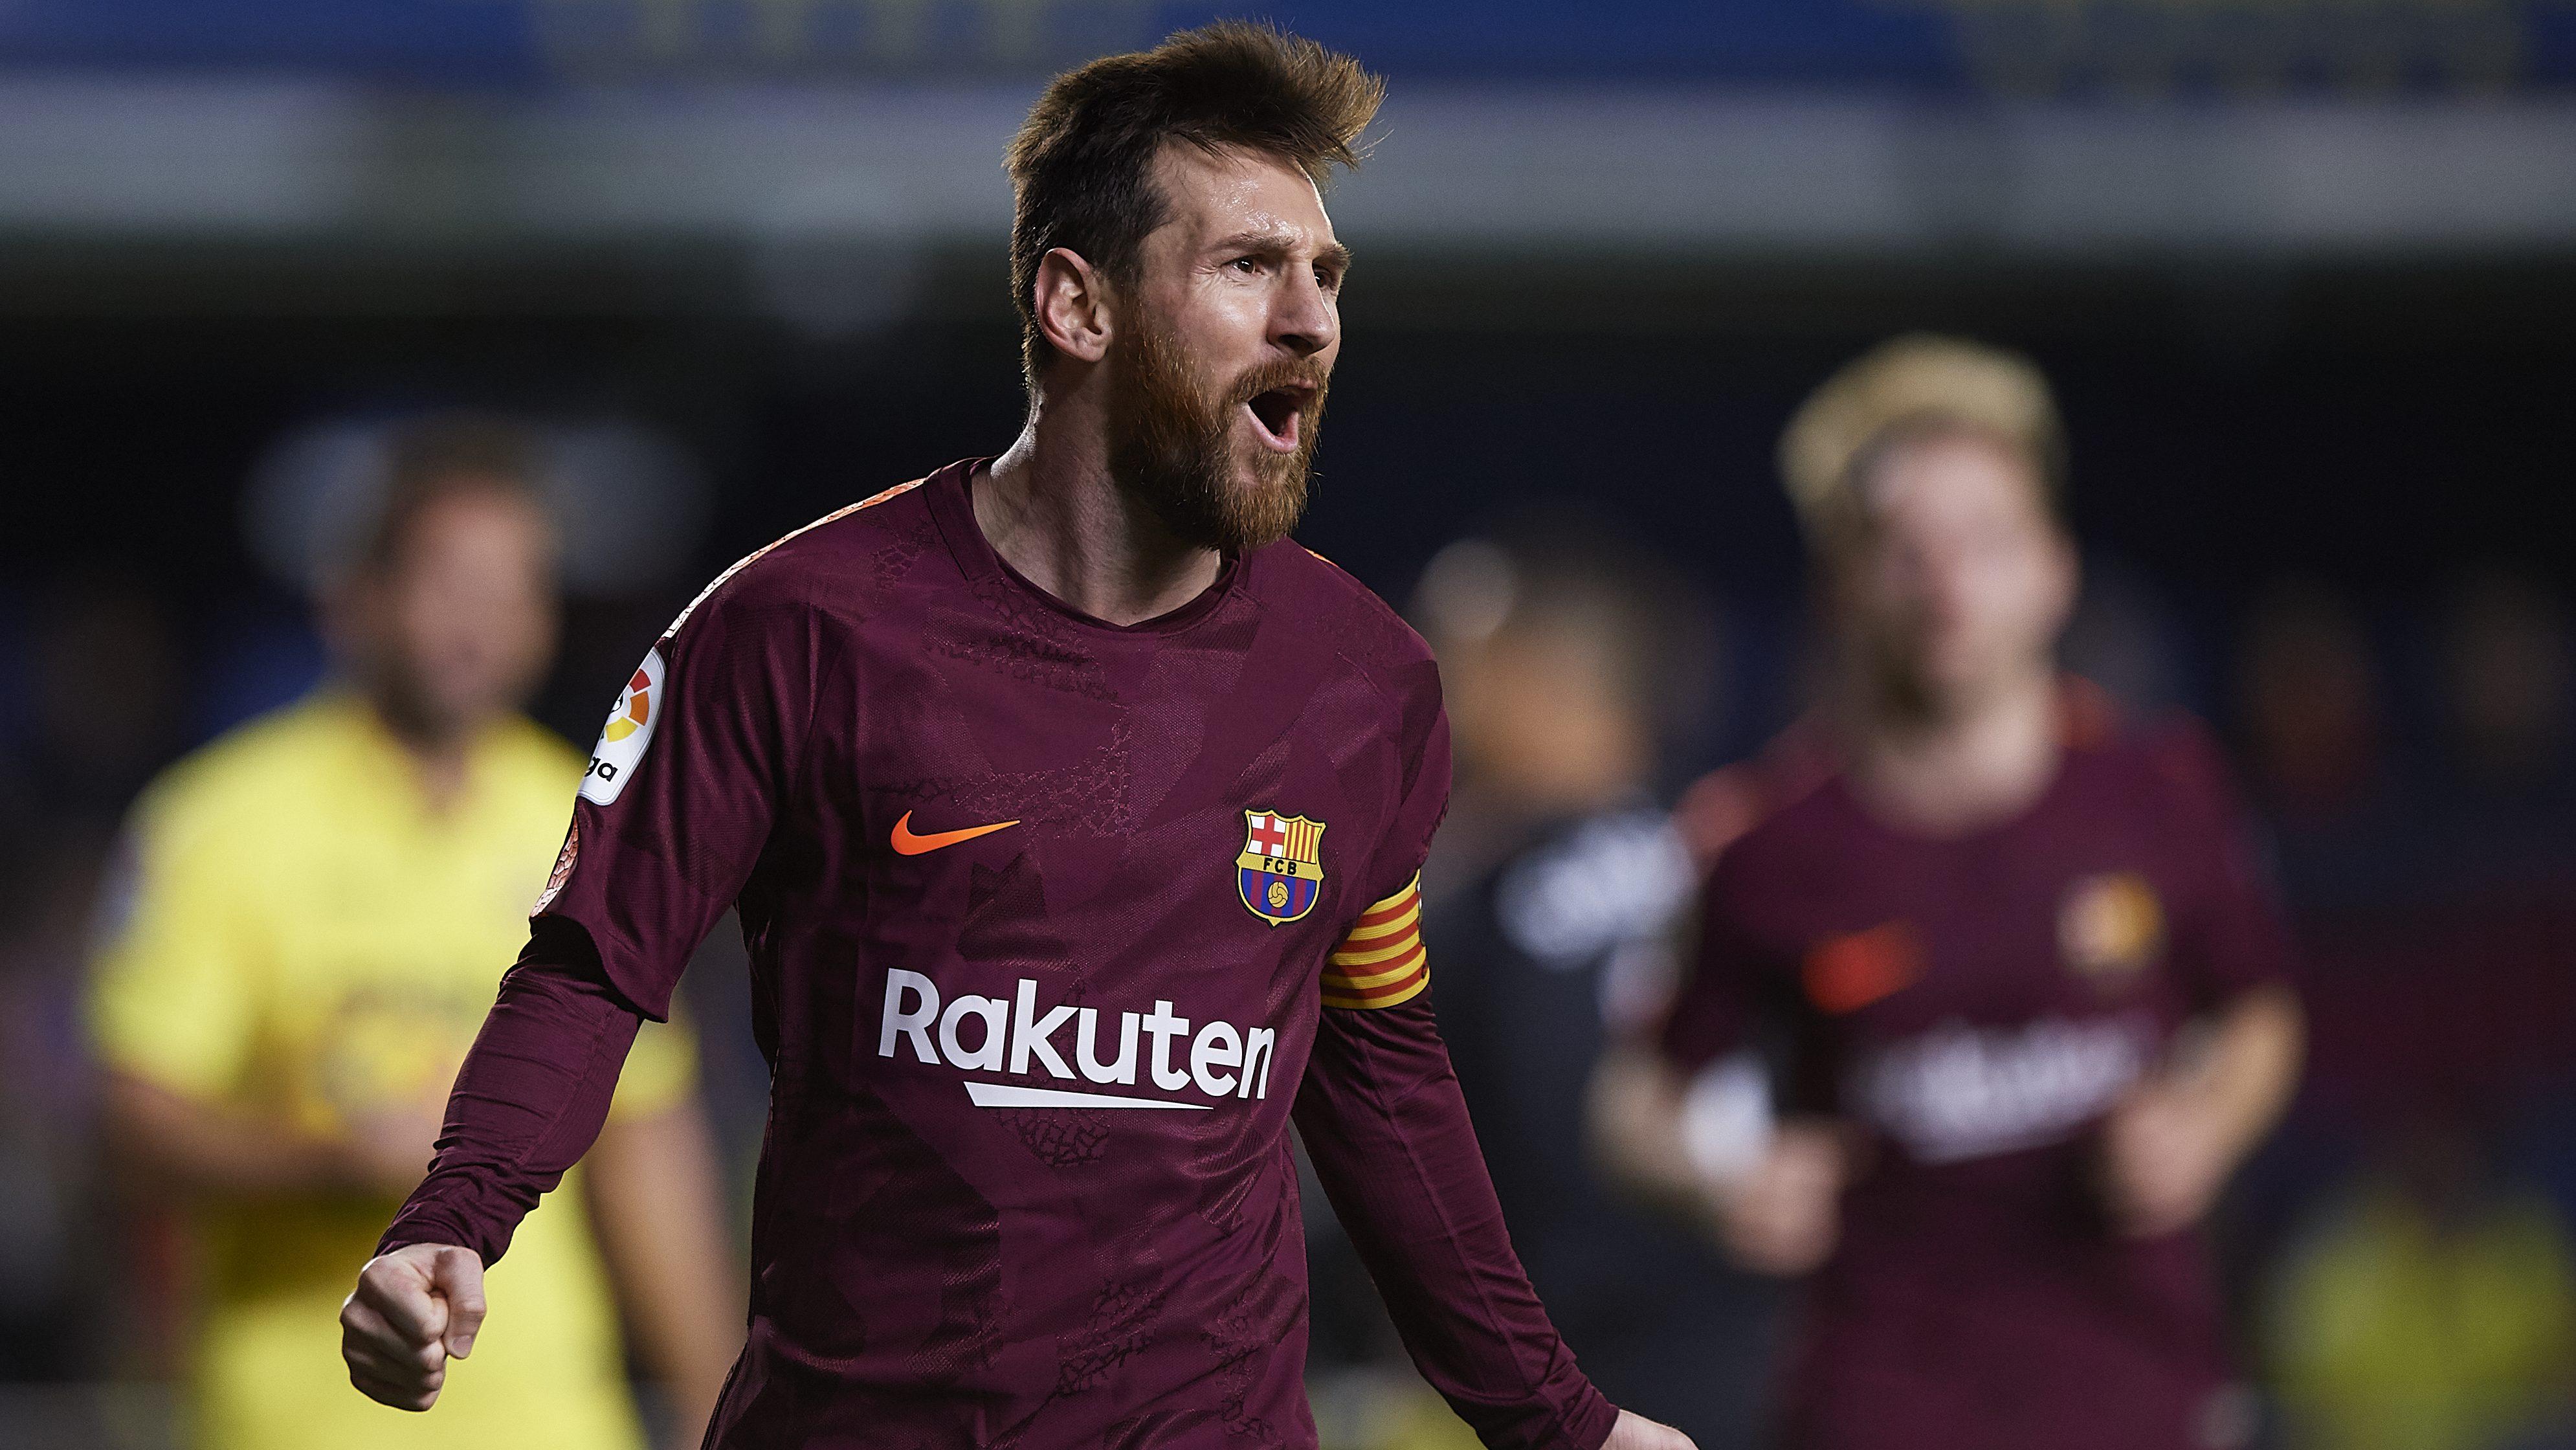 El Clasico Live Stream How To Watch Real Madrid Vs Barca Heavy Com